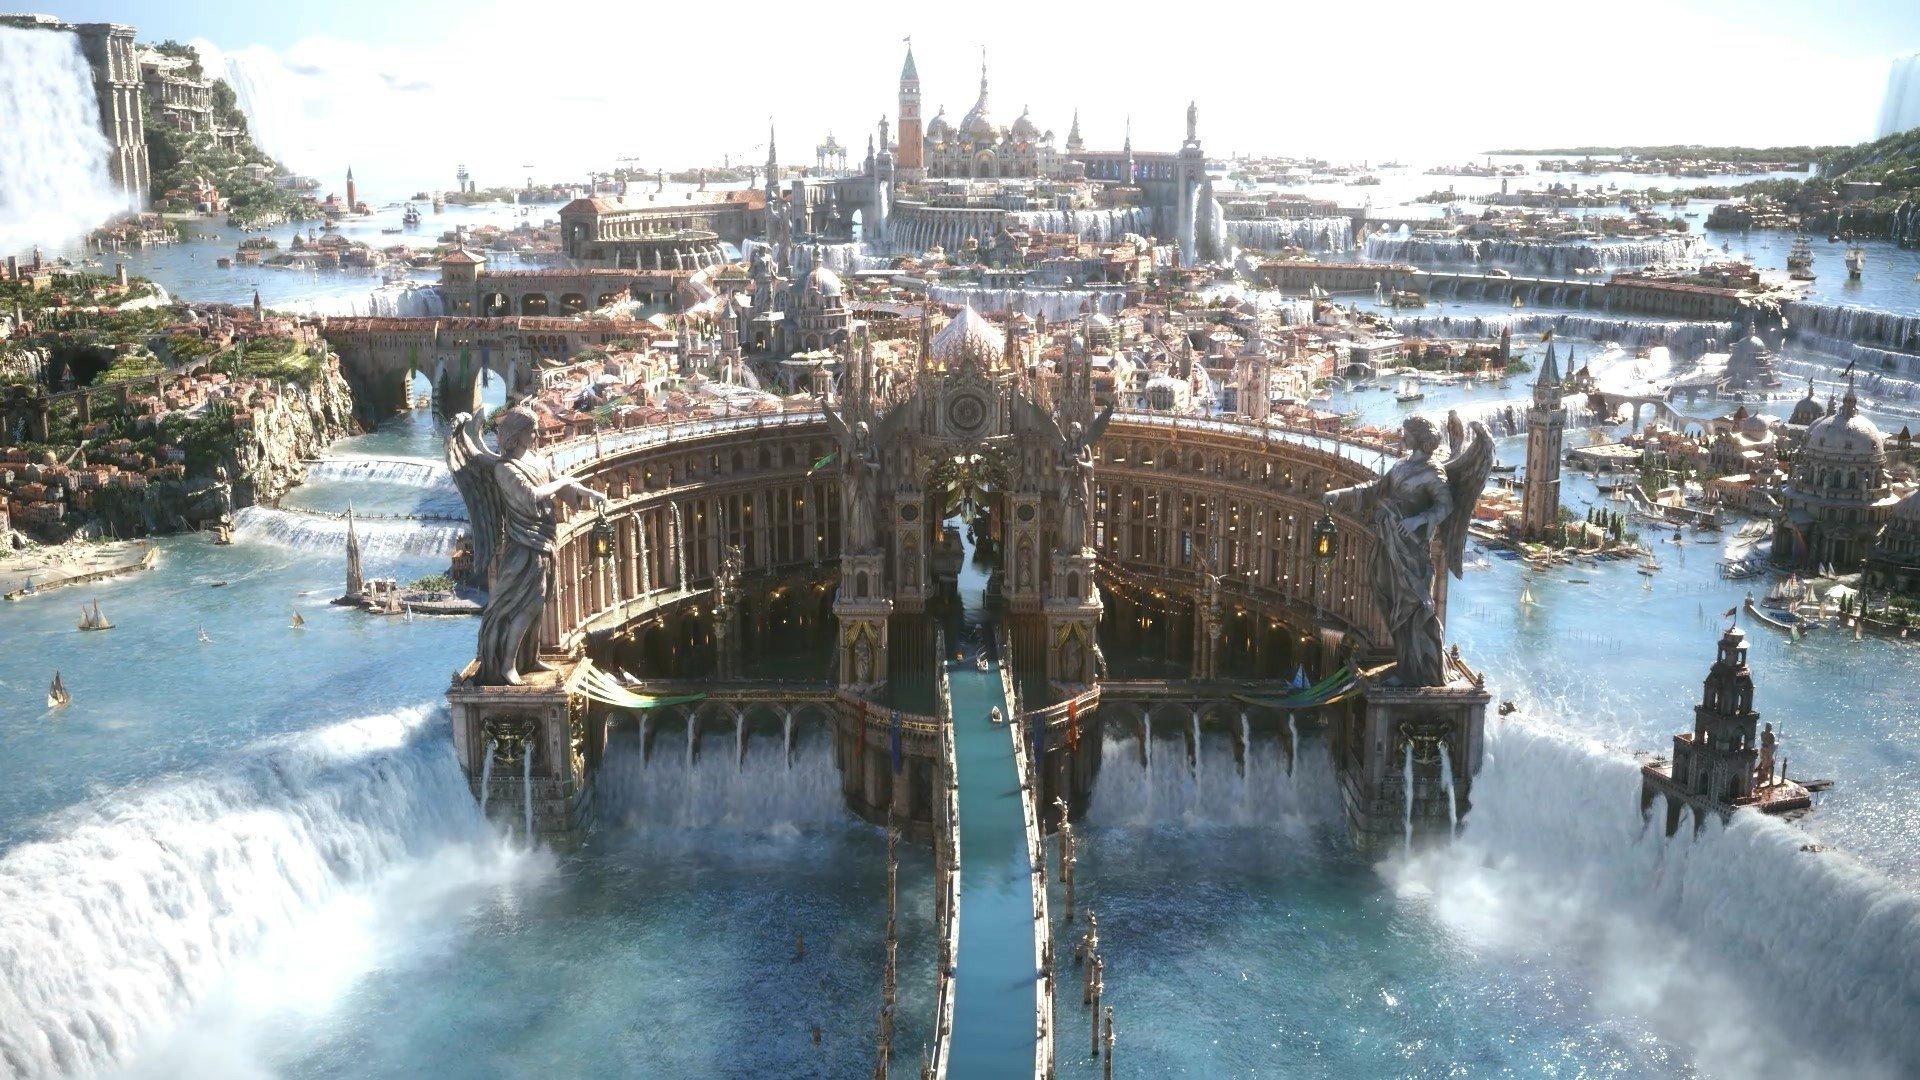 Download Final Fantasy Background Gif